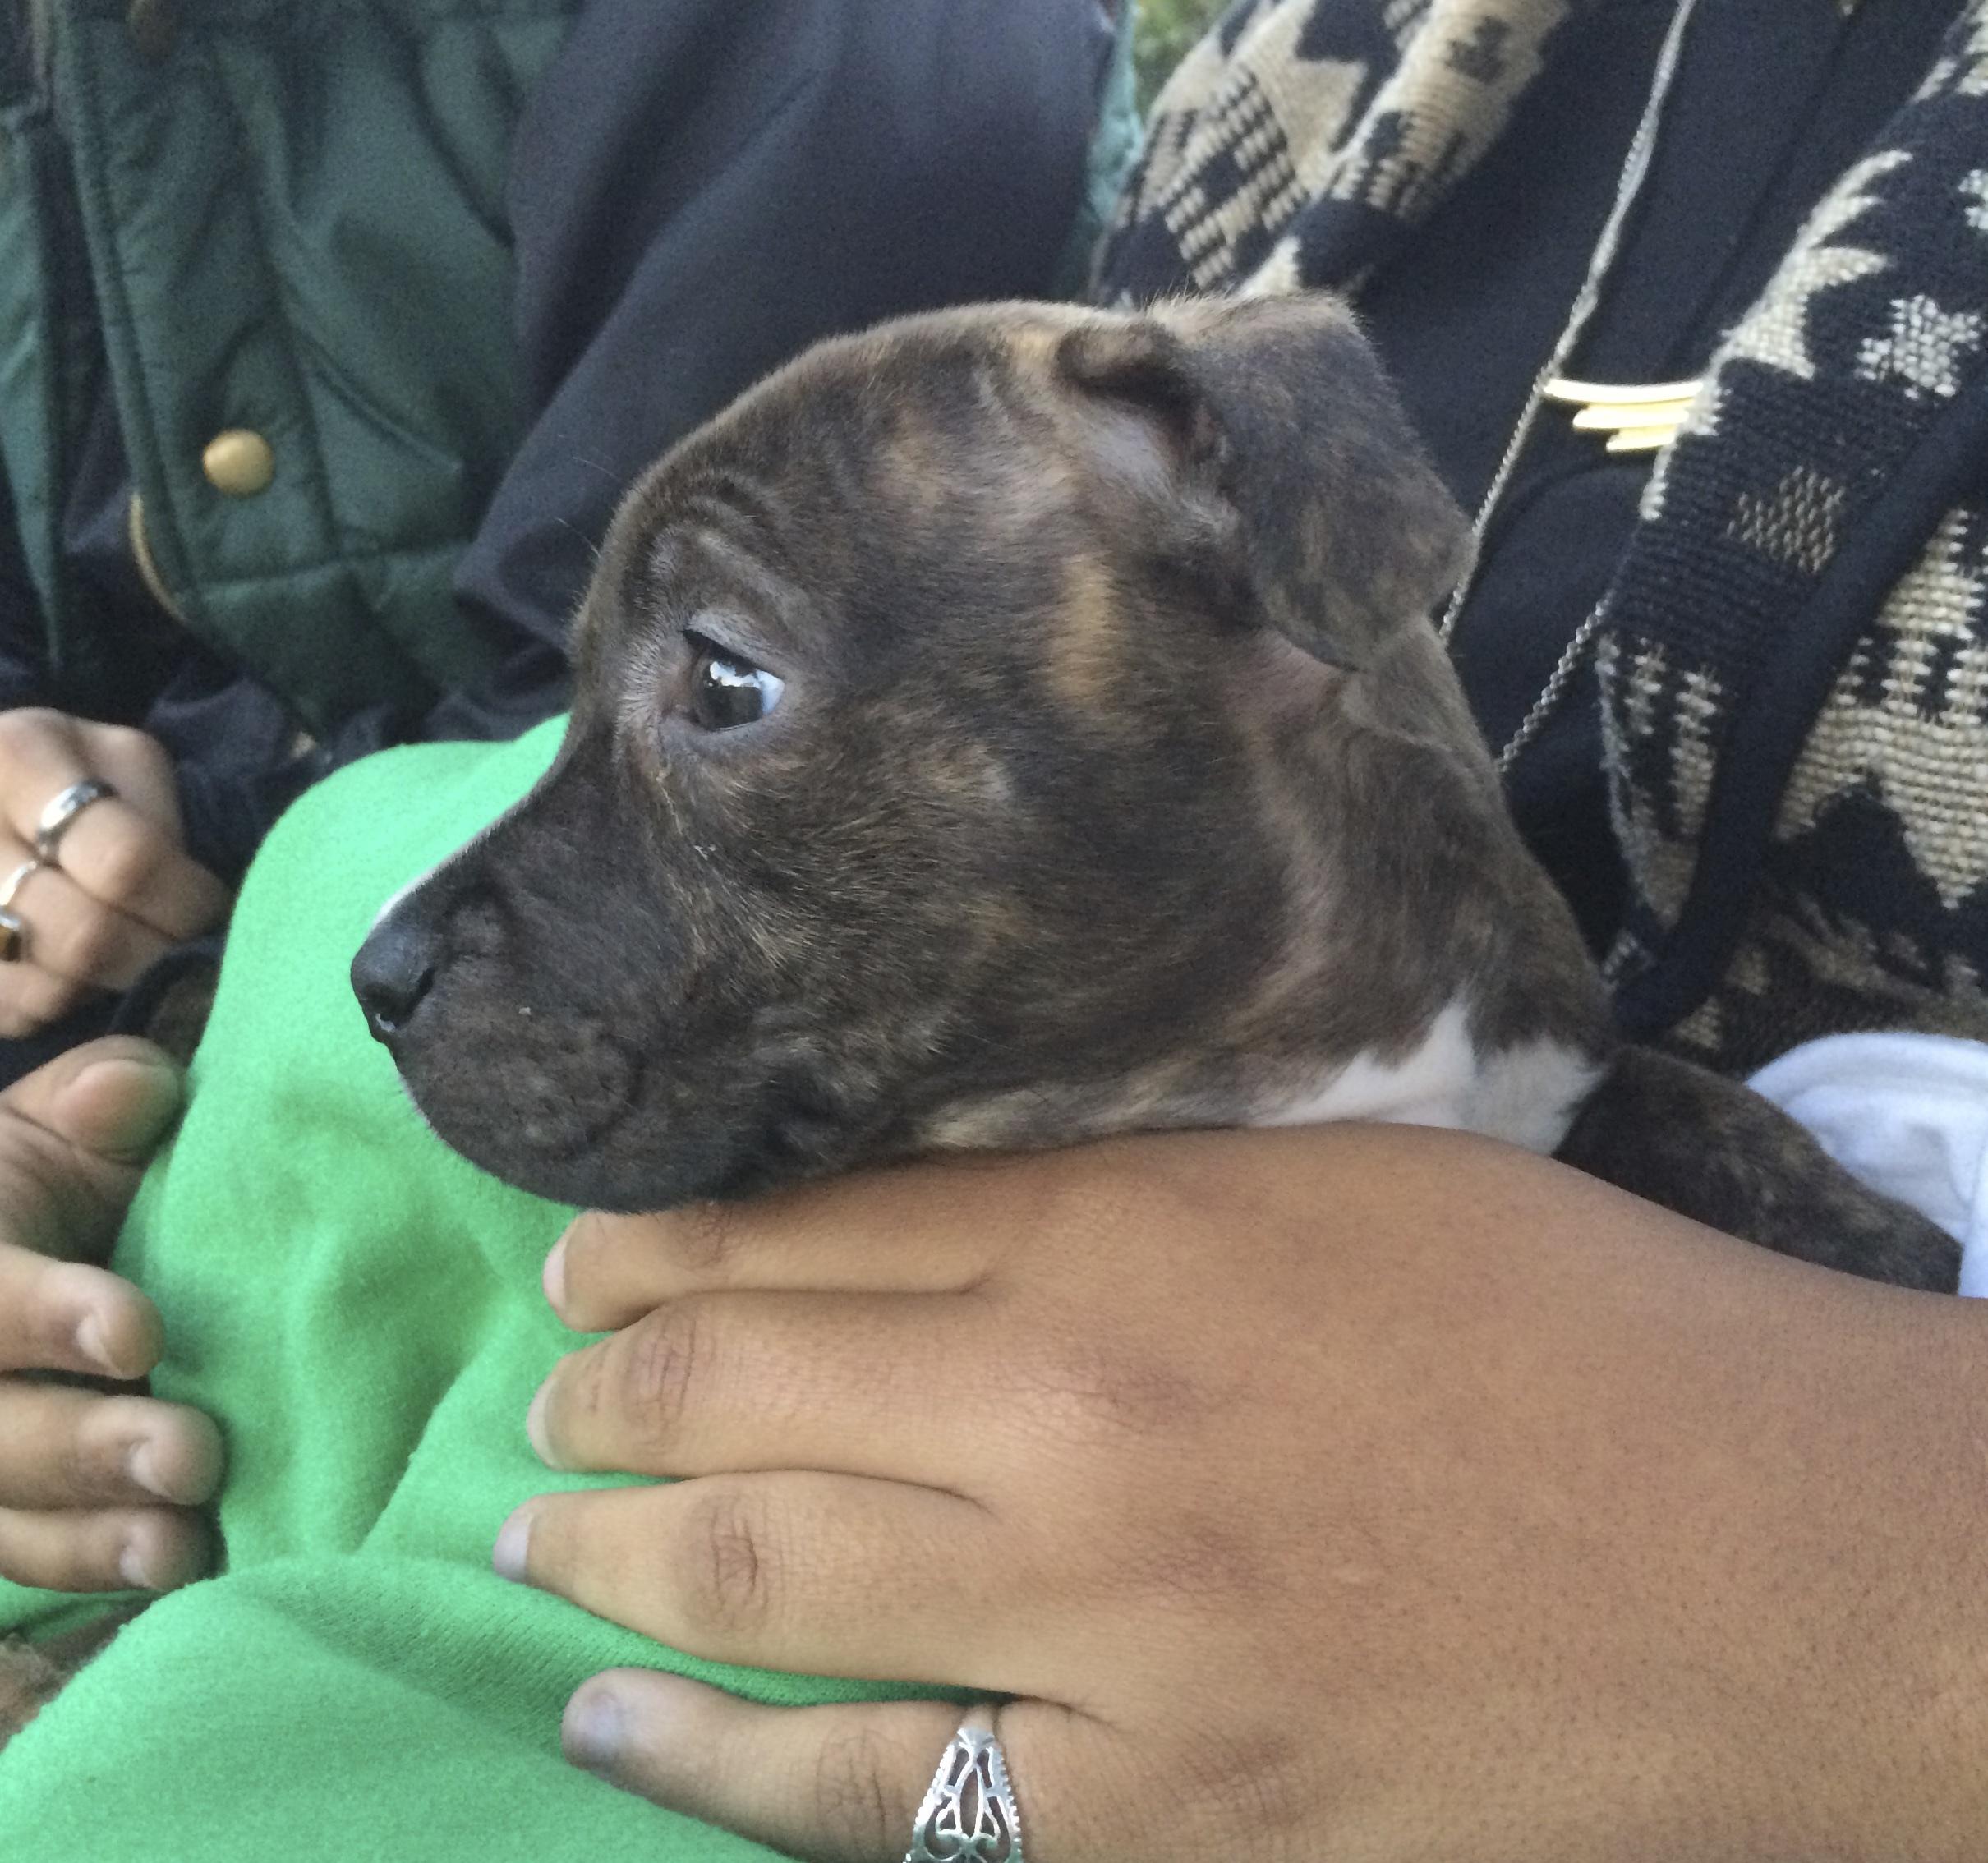 4-Week-Old Brindled American Pit Bull Terrier Puppy Held By Woman